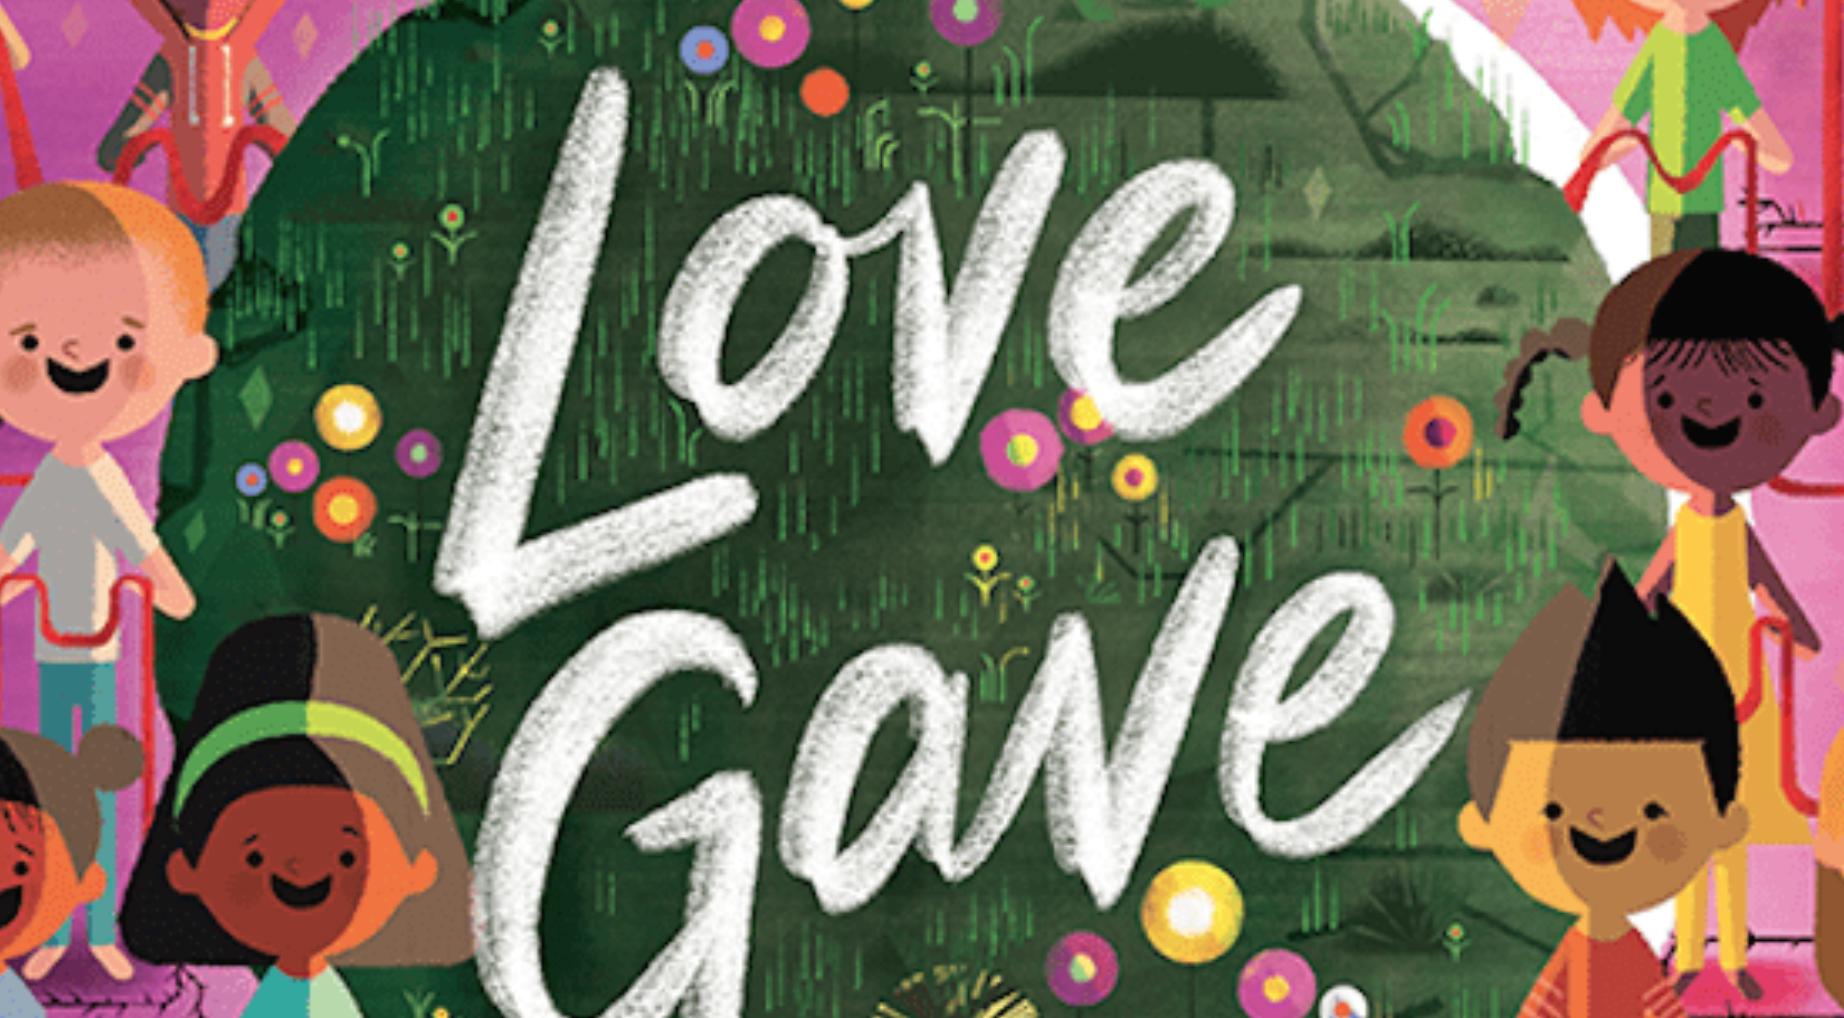 Sneak Peek Interview with Melissa Kruger (Love Gave Book)